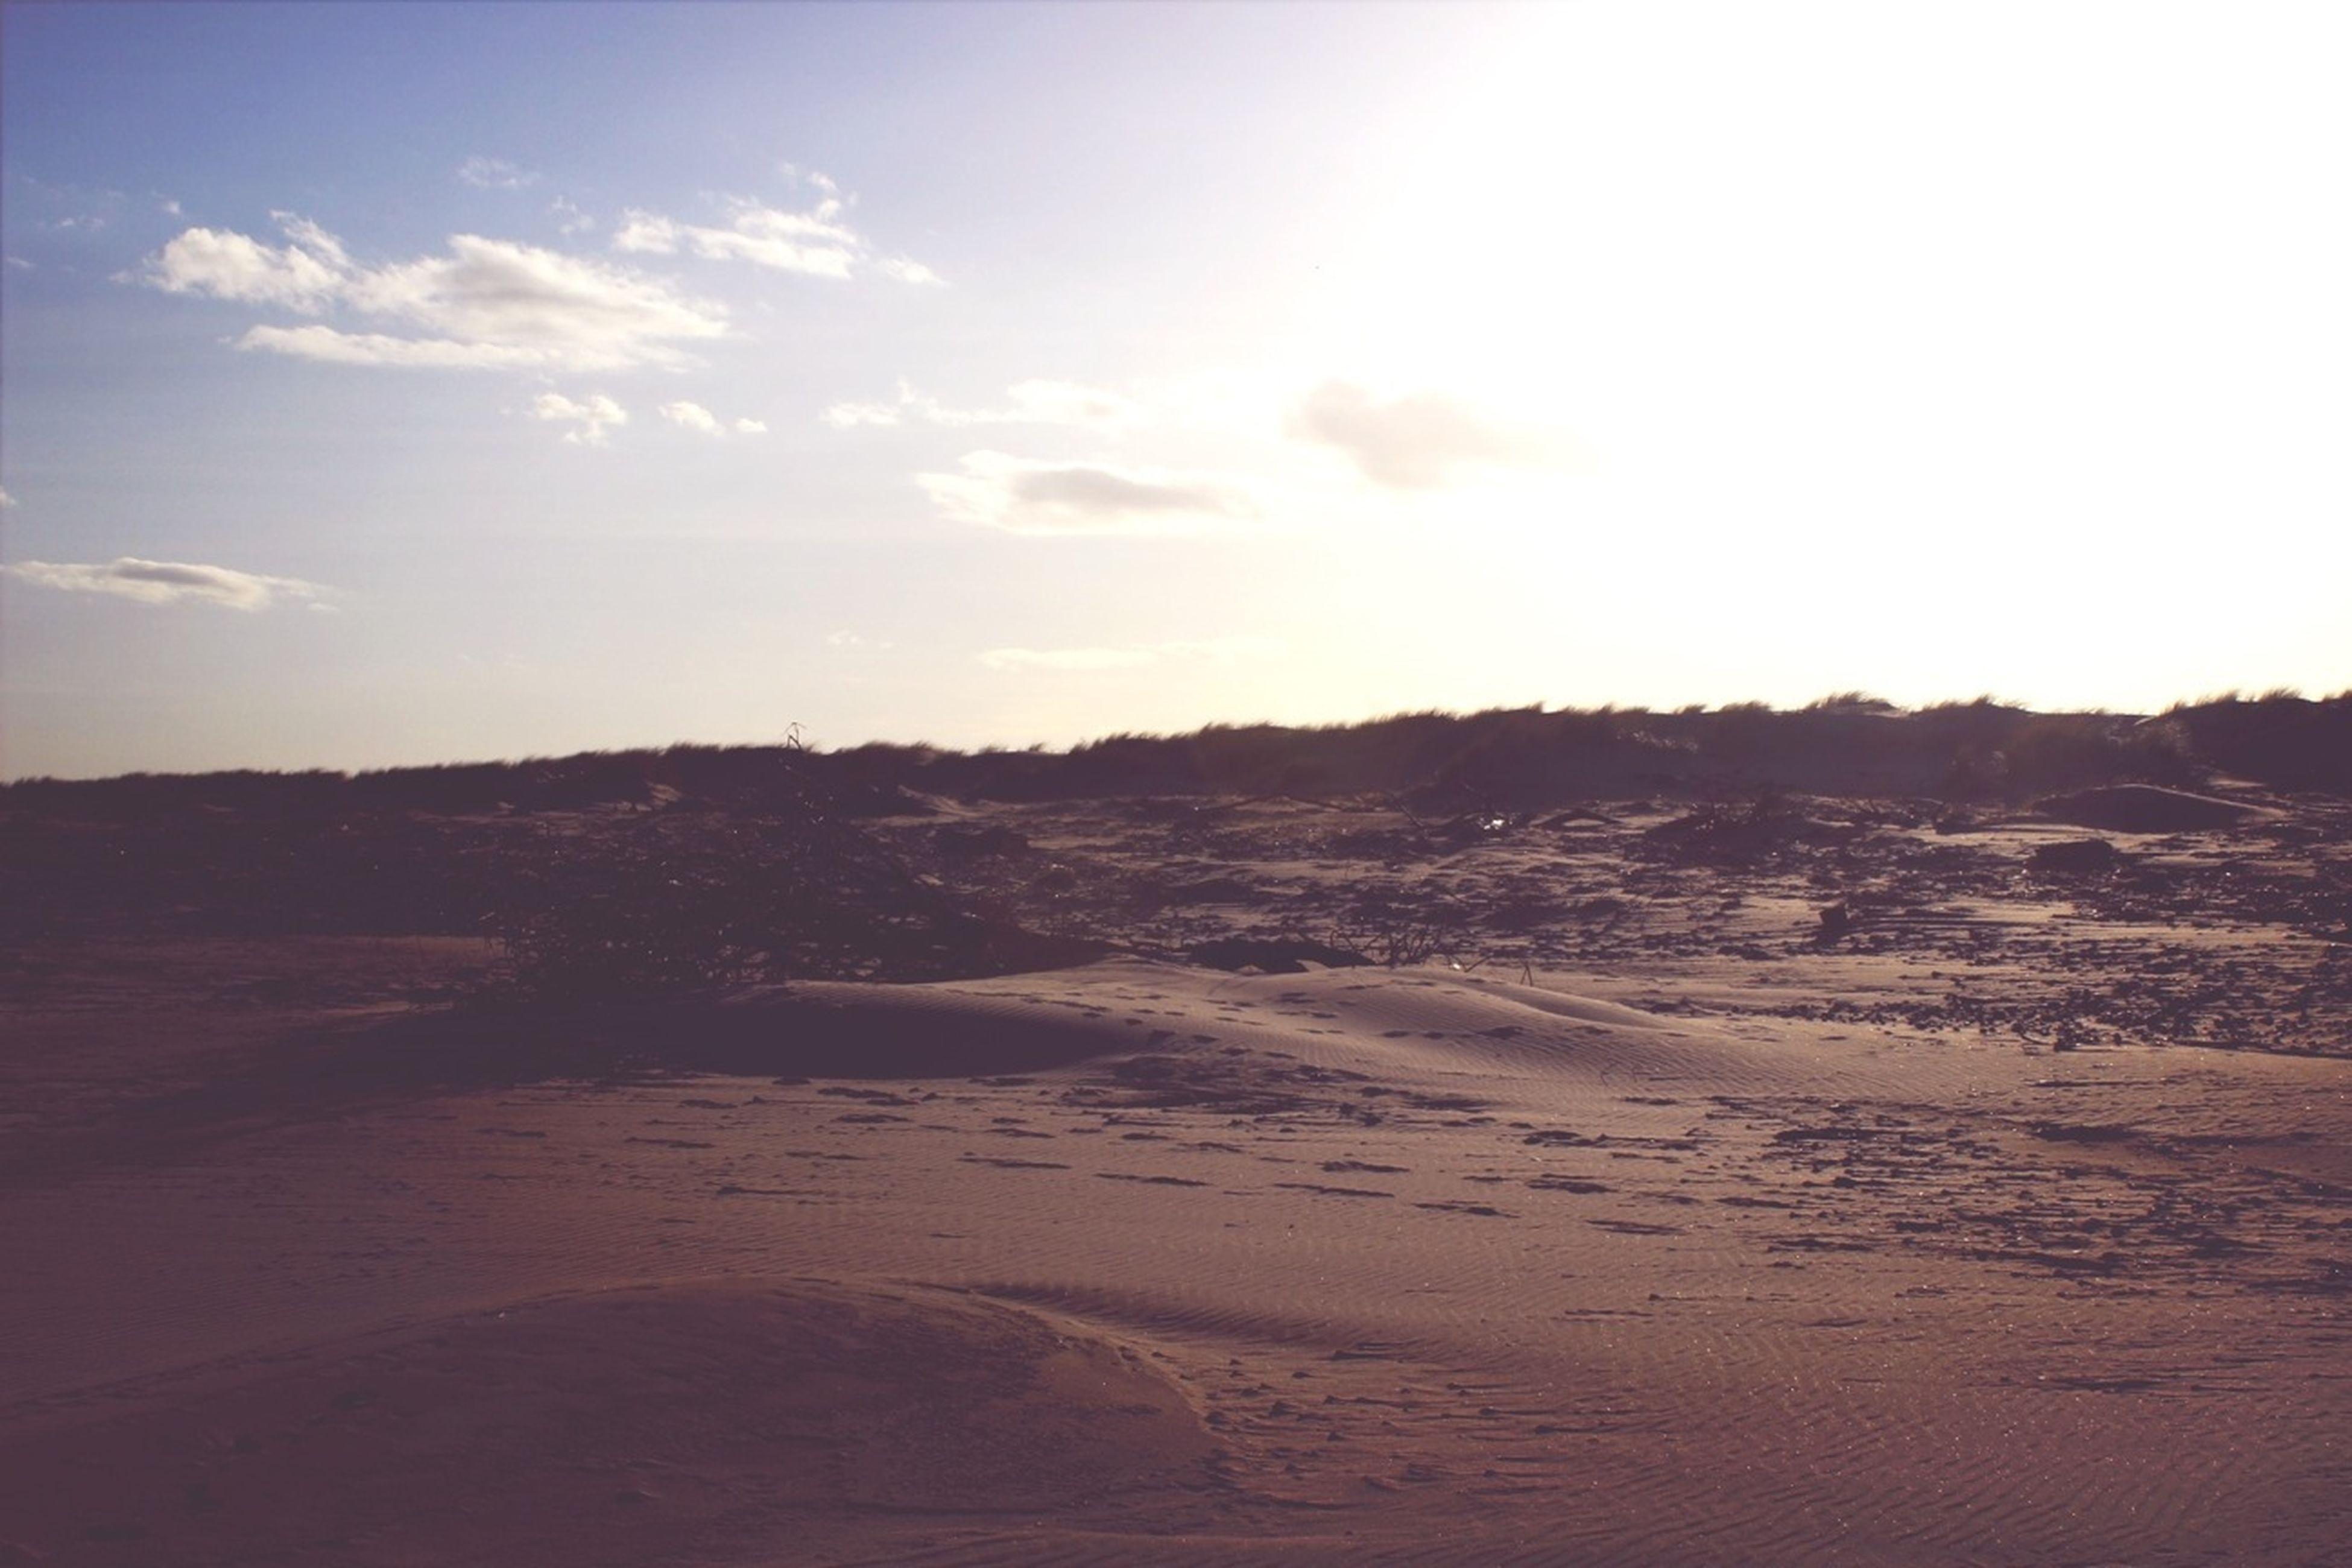 tranquil scene, tranquility, landscape, scenics, sky, desert, nature, beauty in nature, sand, arid climate, non-urban scene, remote, barren, sunlight, horizon over land, idyllic, outdoors, sunset, sand dune, cloud - sky